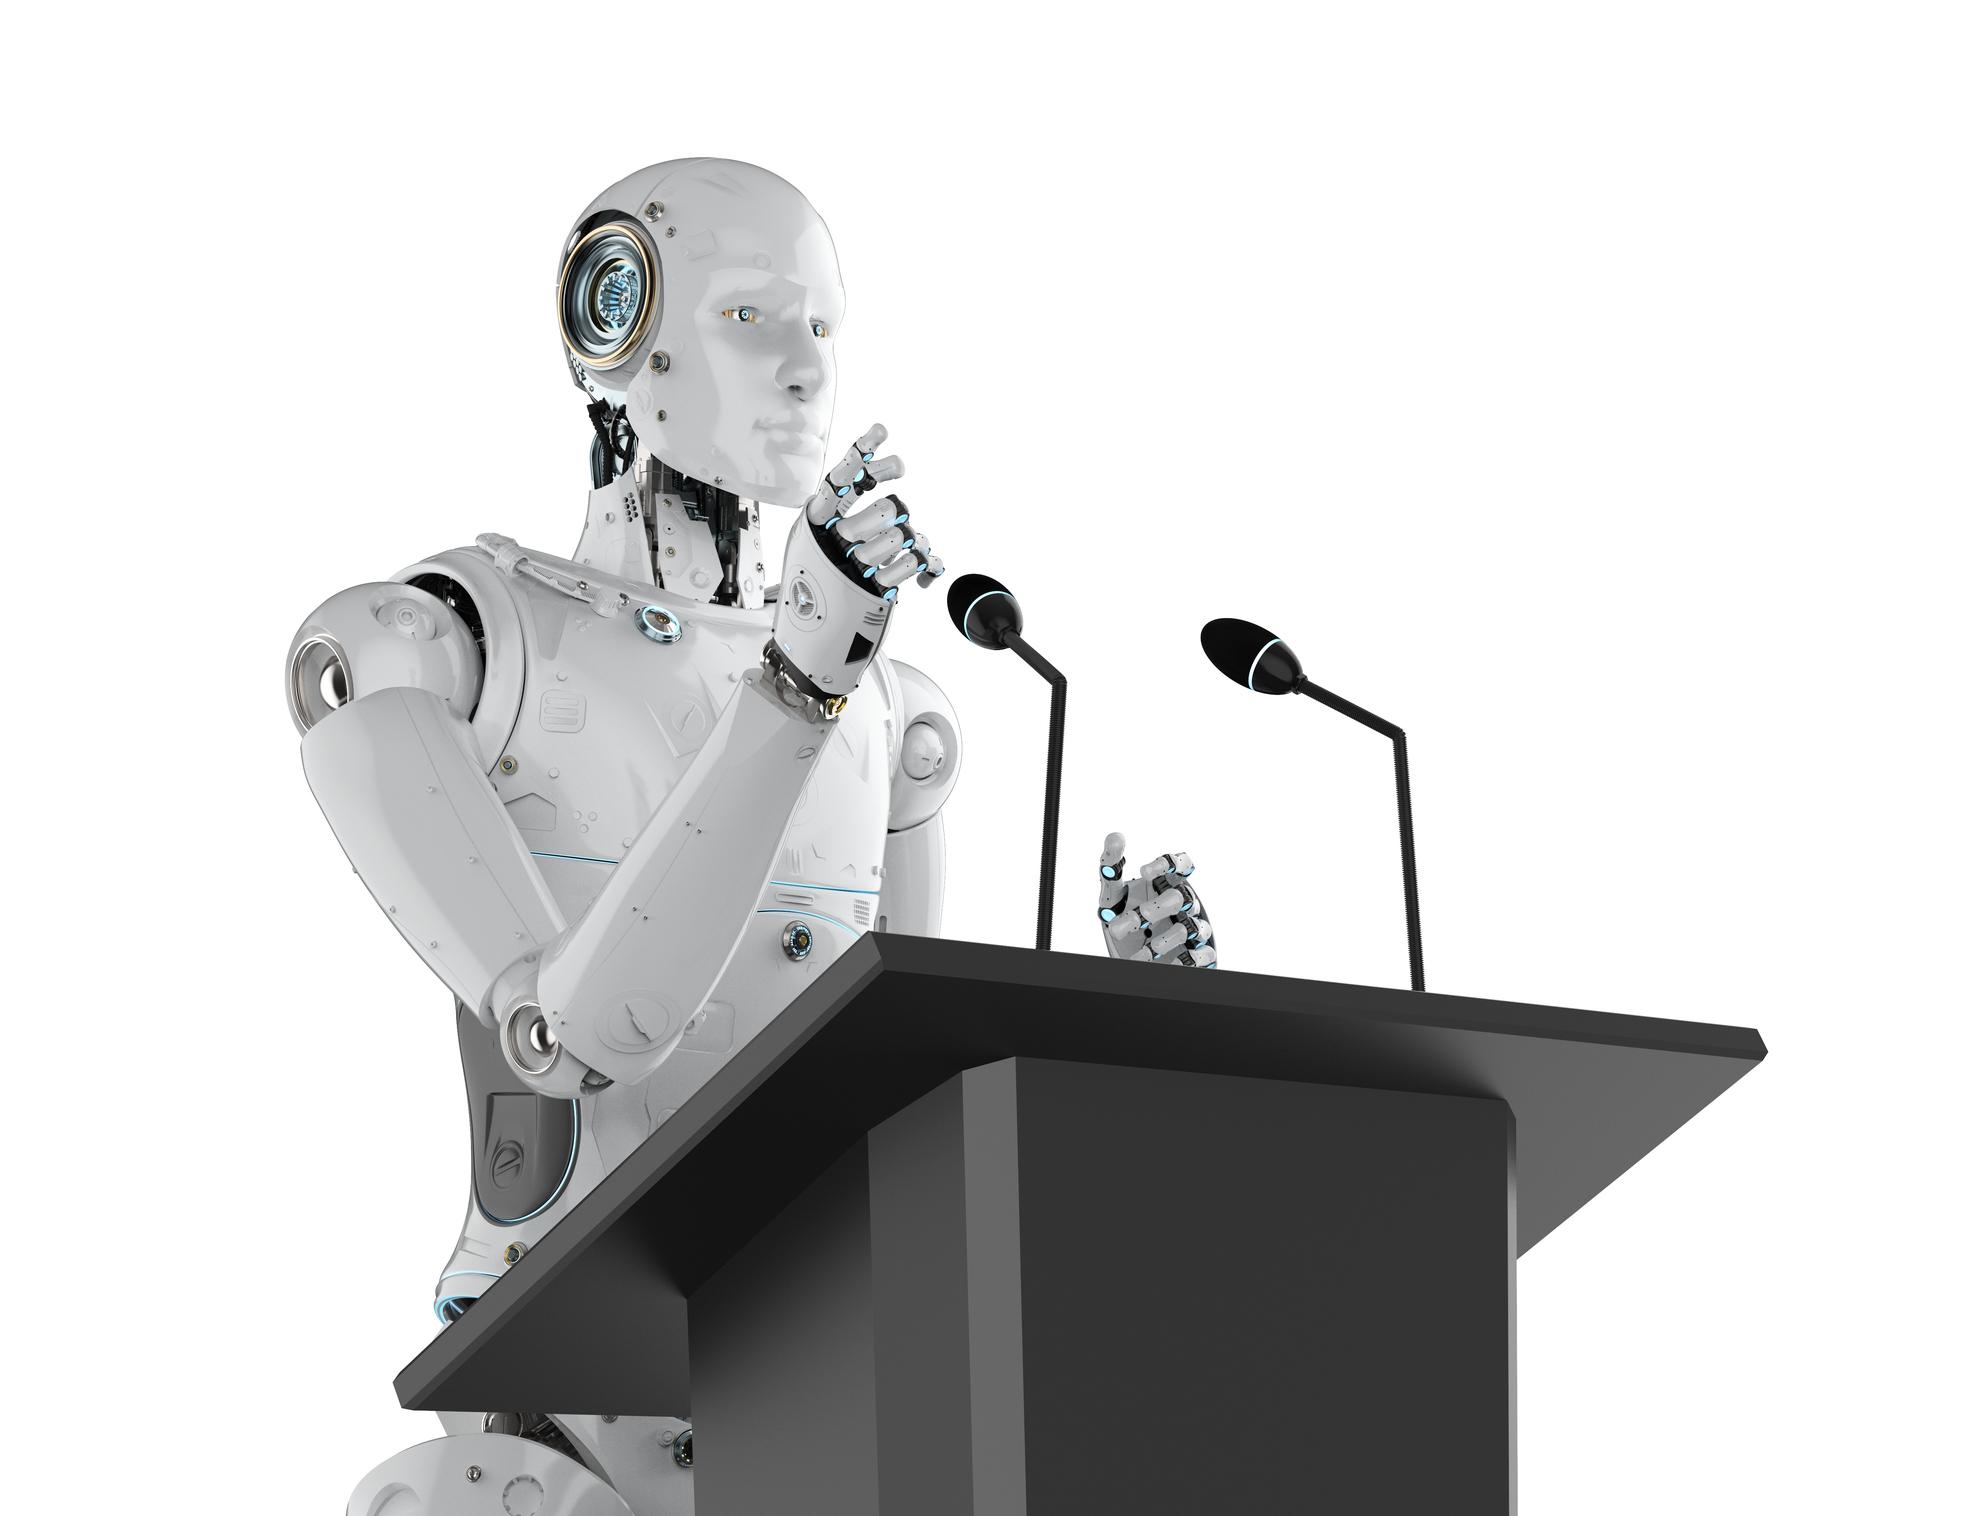 debate robot getty